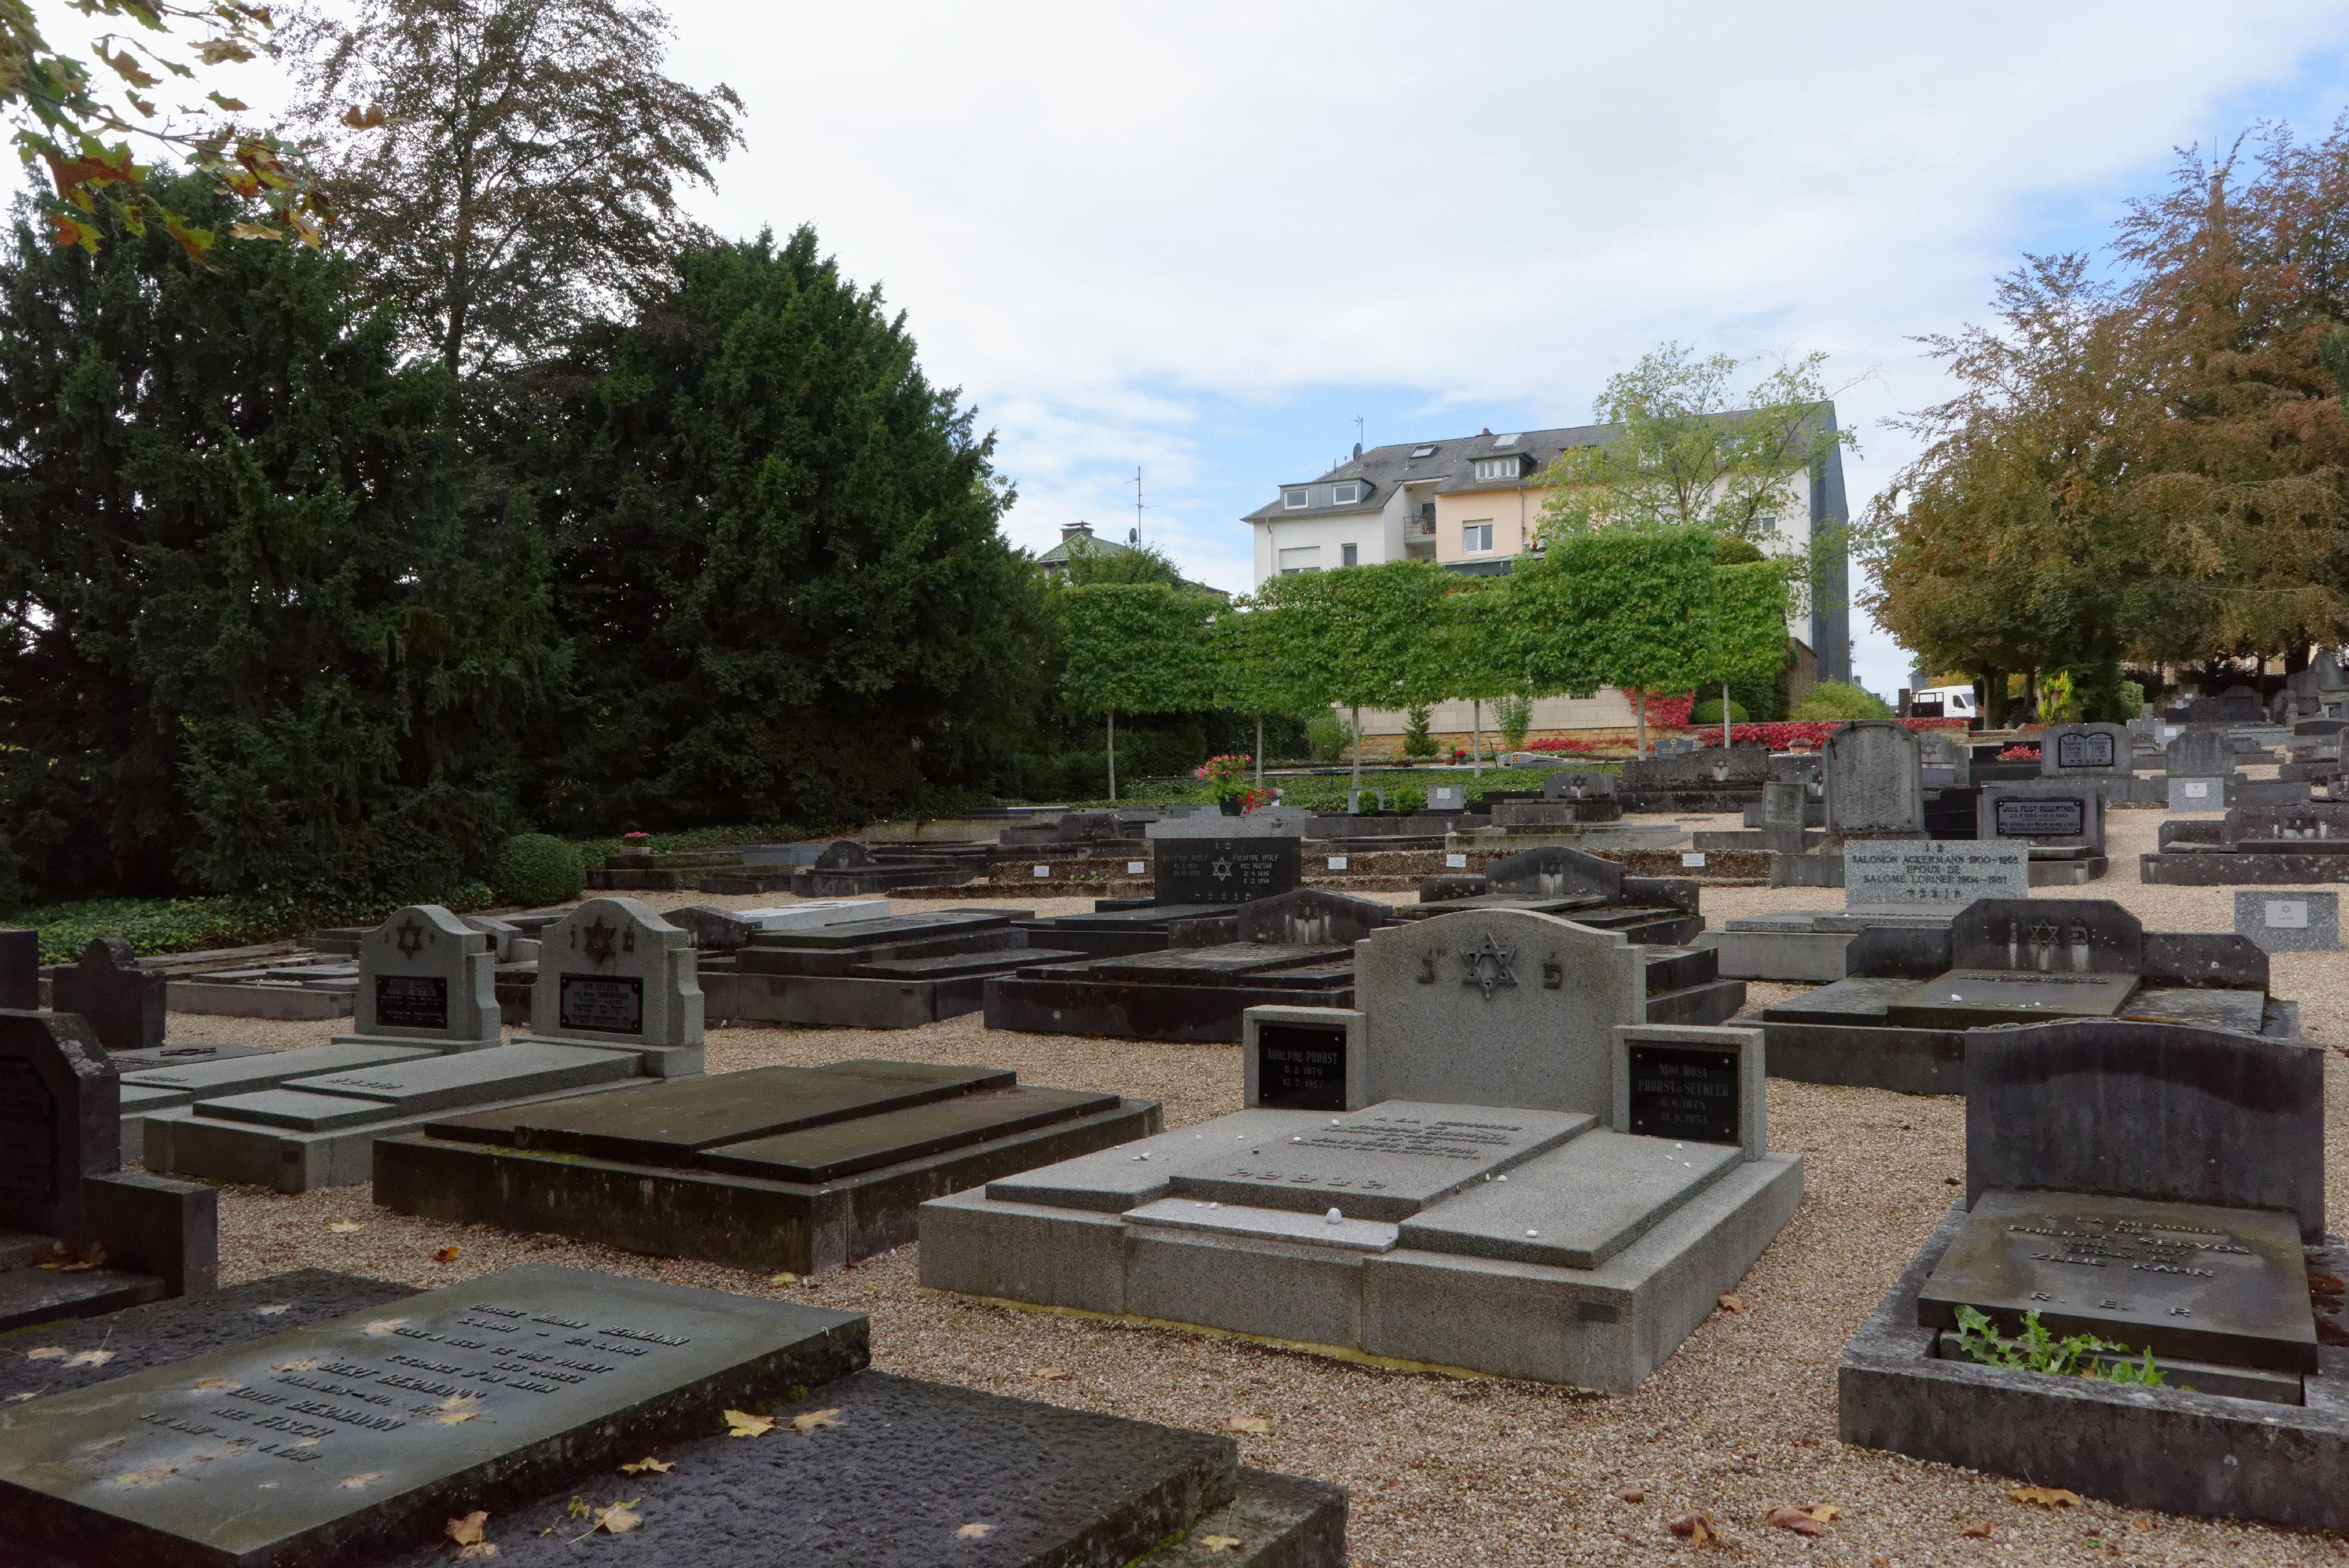 File:LUX, jüdischer Friedhof KSG 1607 pK jpg - Wikimedia Commons